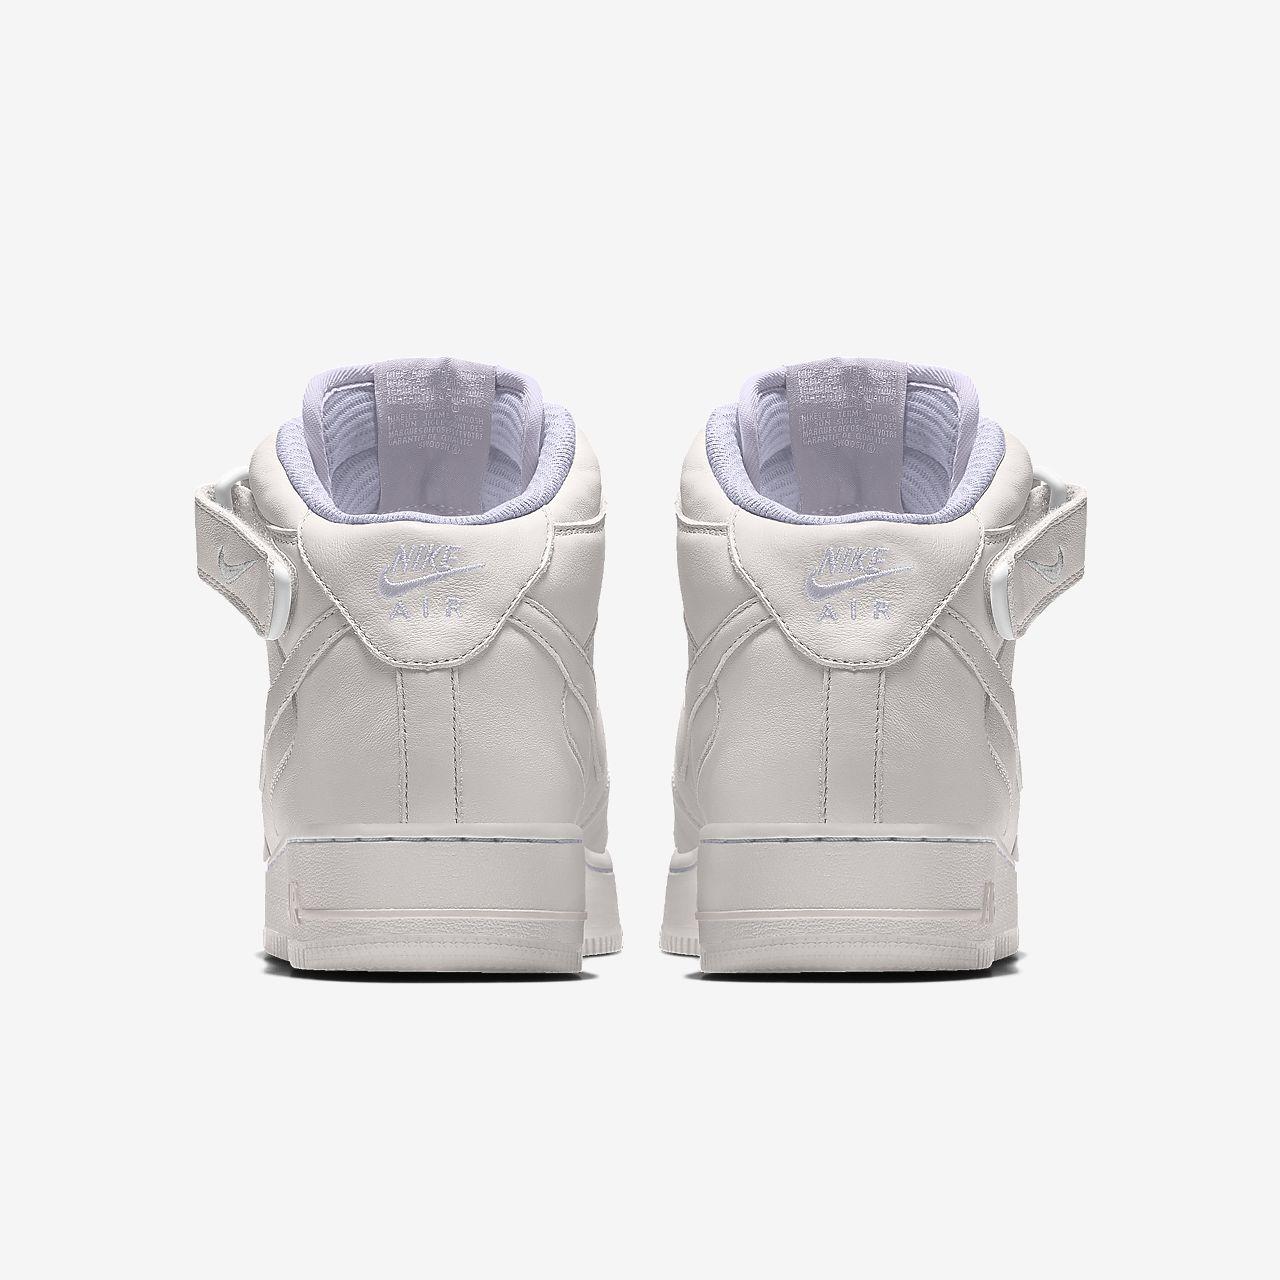 Nike Air Force 1 Mid By You custom sko til mænd